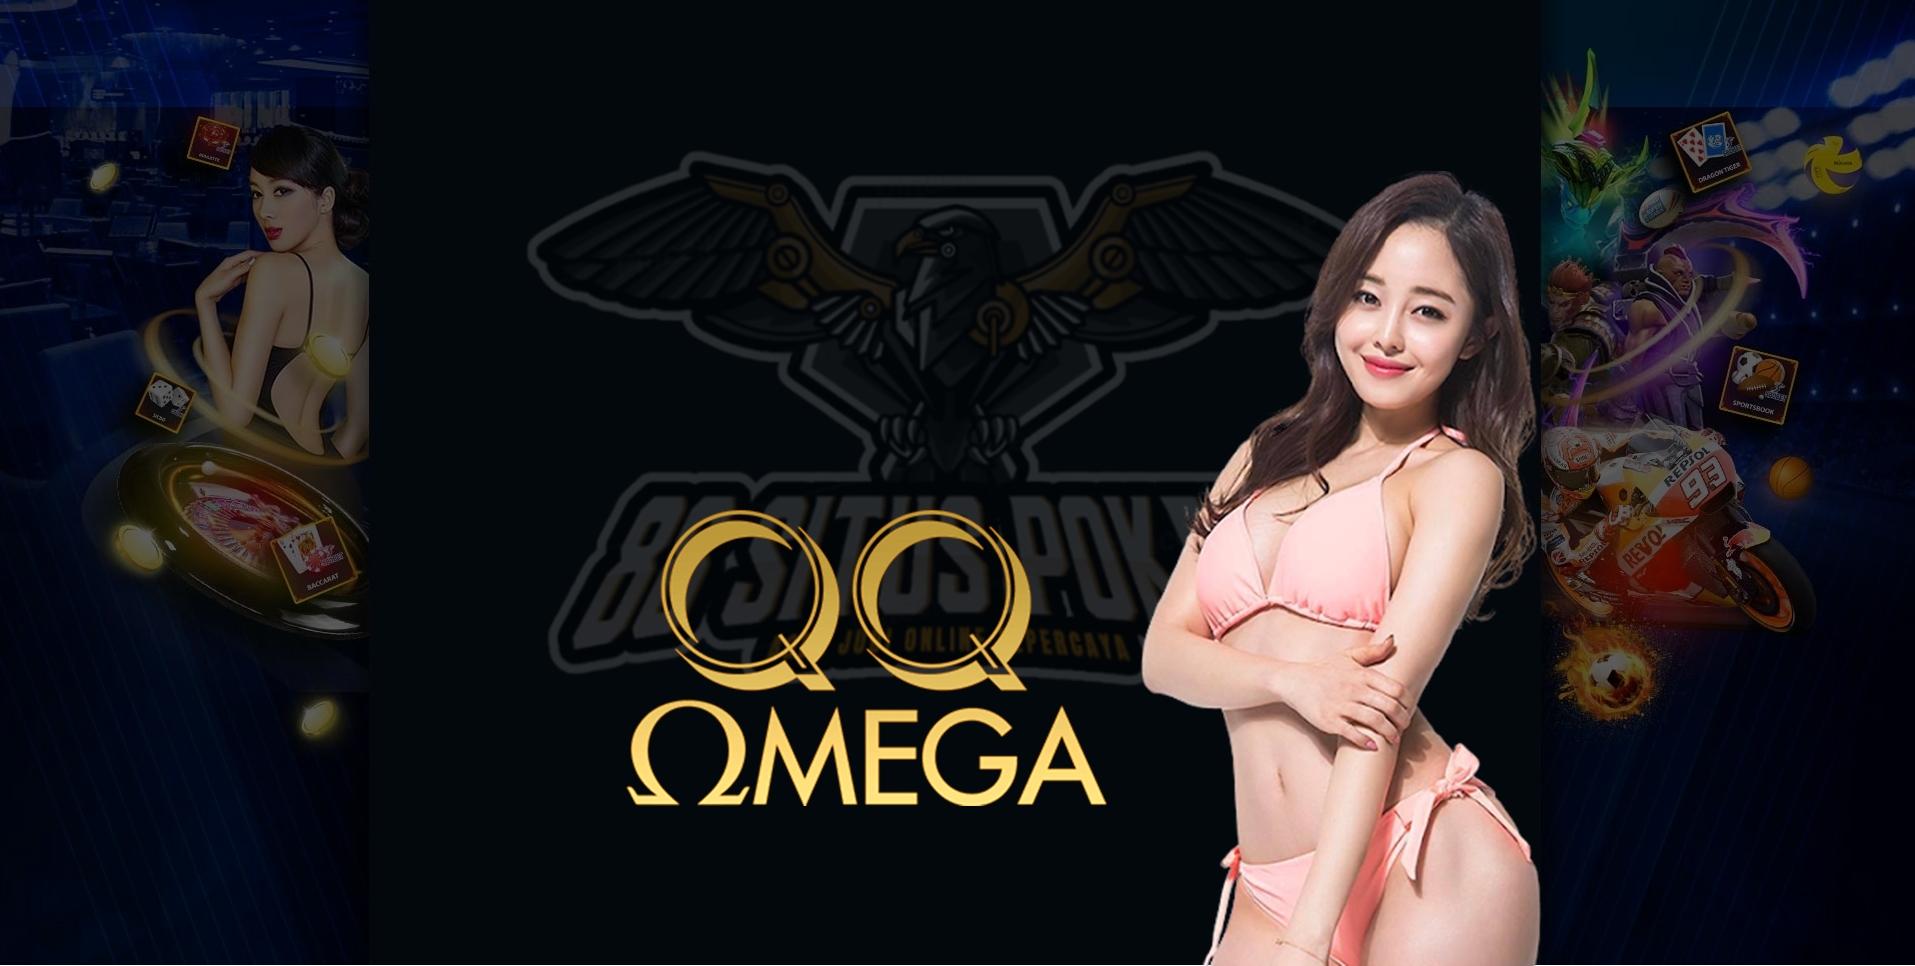 QQOmega: Situs Judi Slot Online